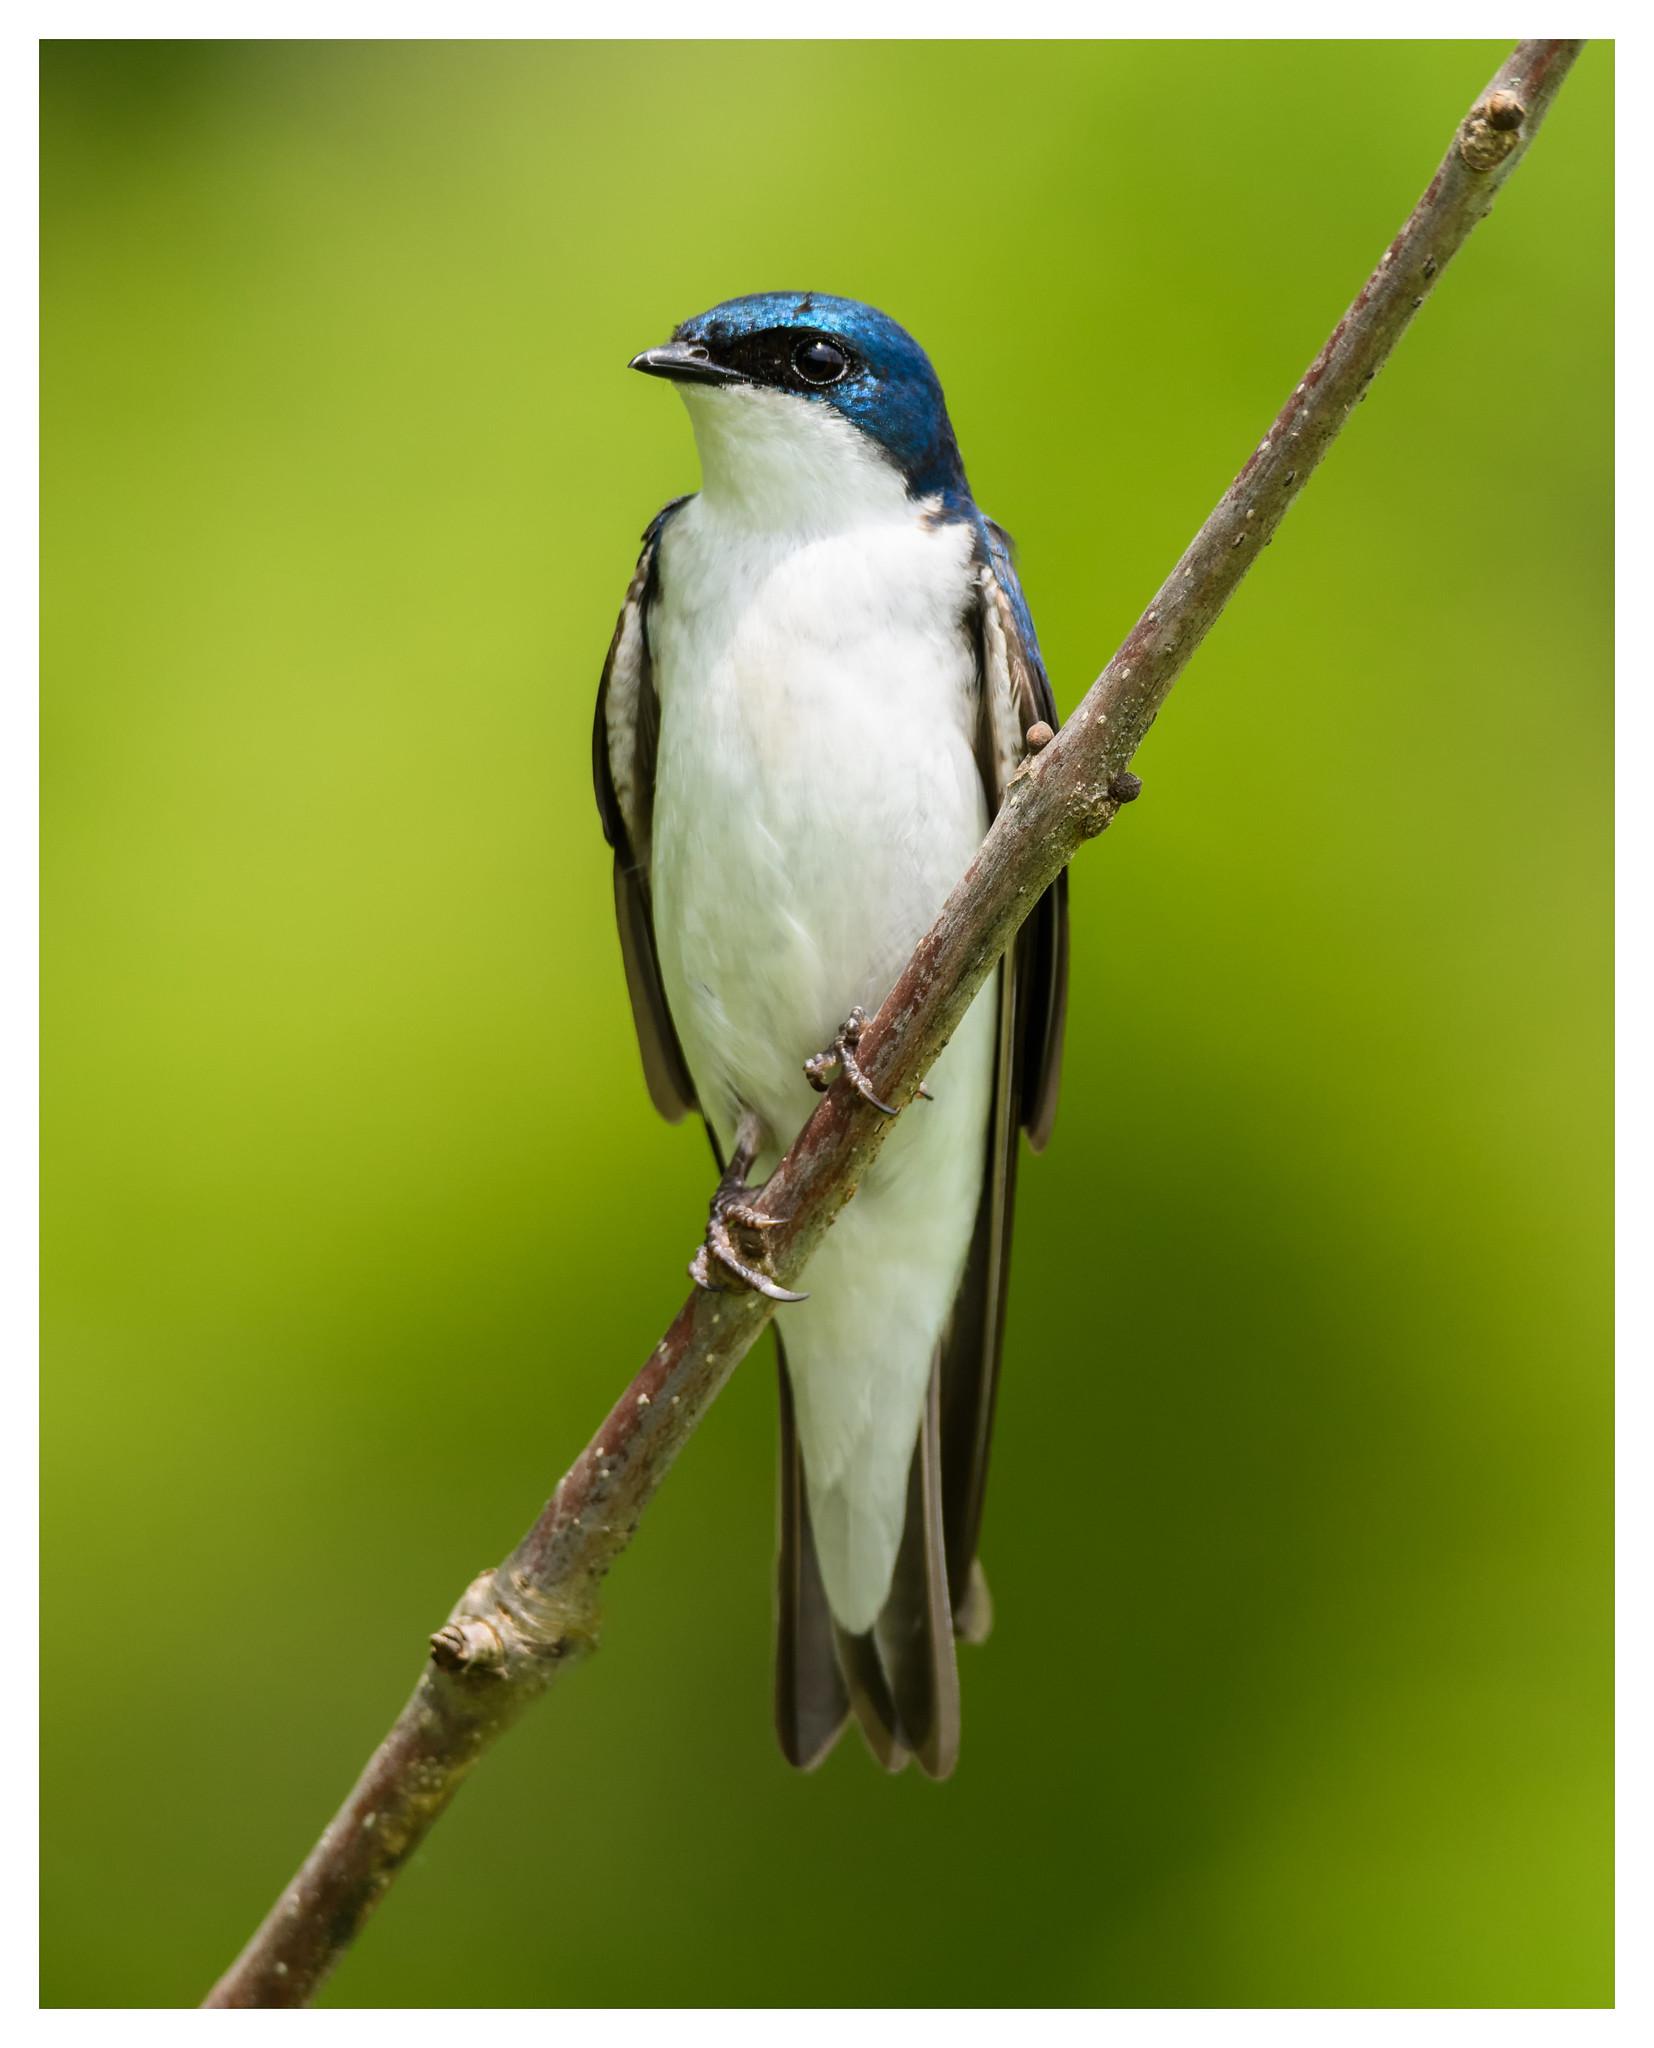 Male Tree Swallow at Sugarcreek Reserve.